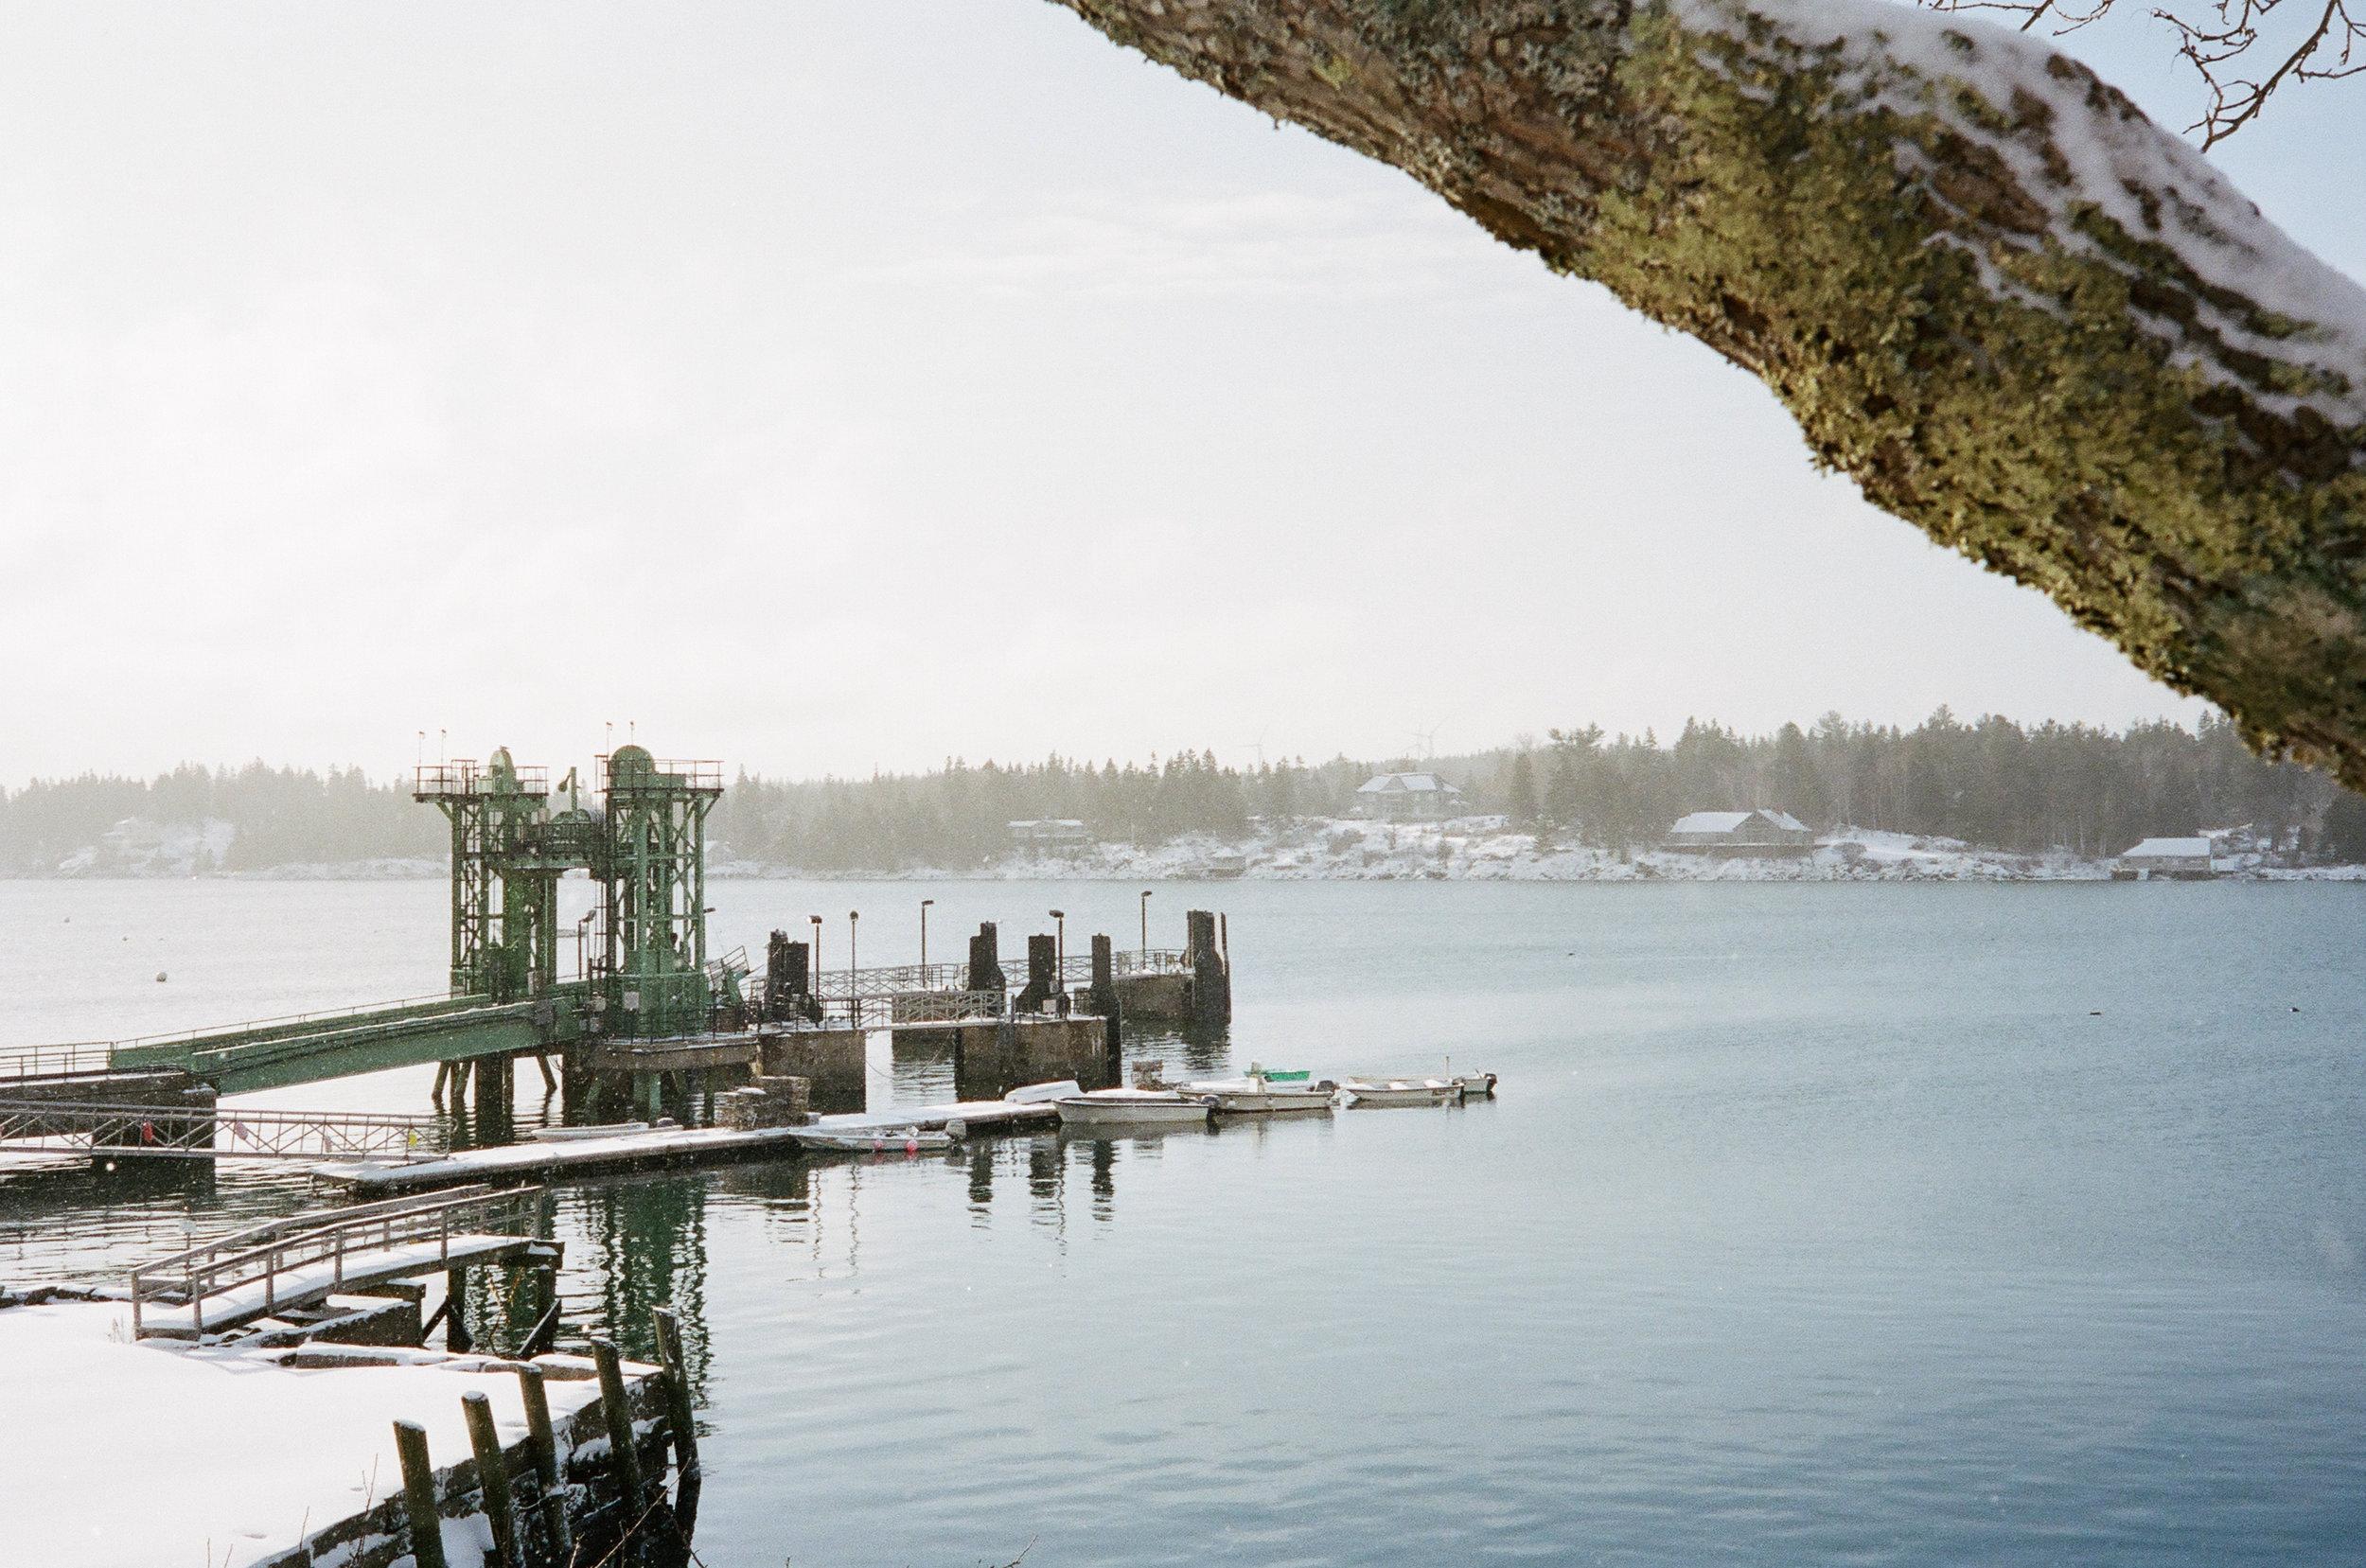 Ferry Dock, 2016 – Photo by Bill Trevaskis